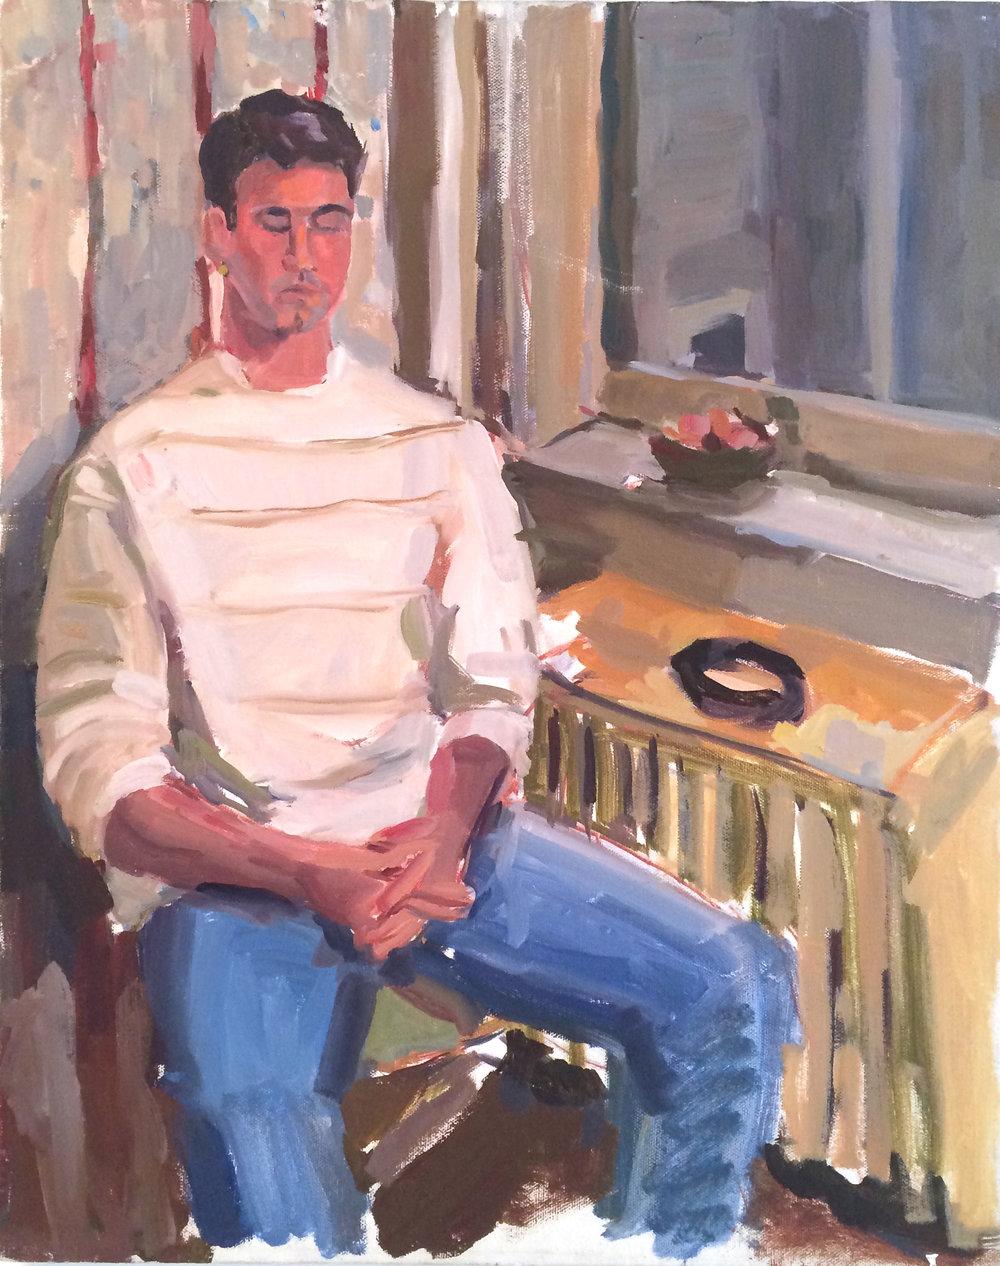 1991. Michael Graziano at 1953 Locust Street, Philadelphia